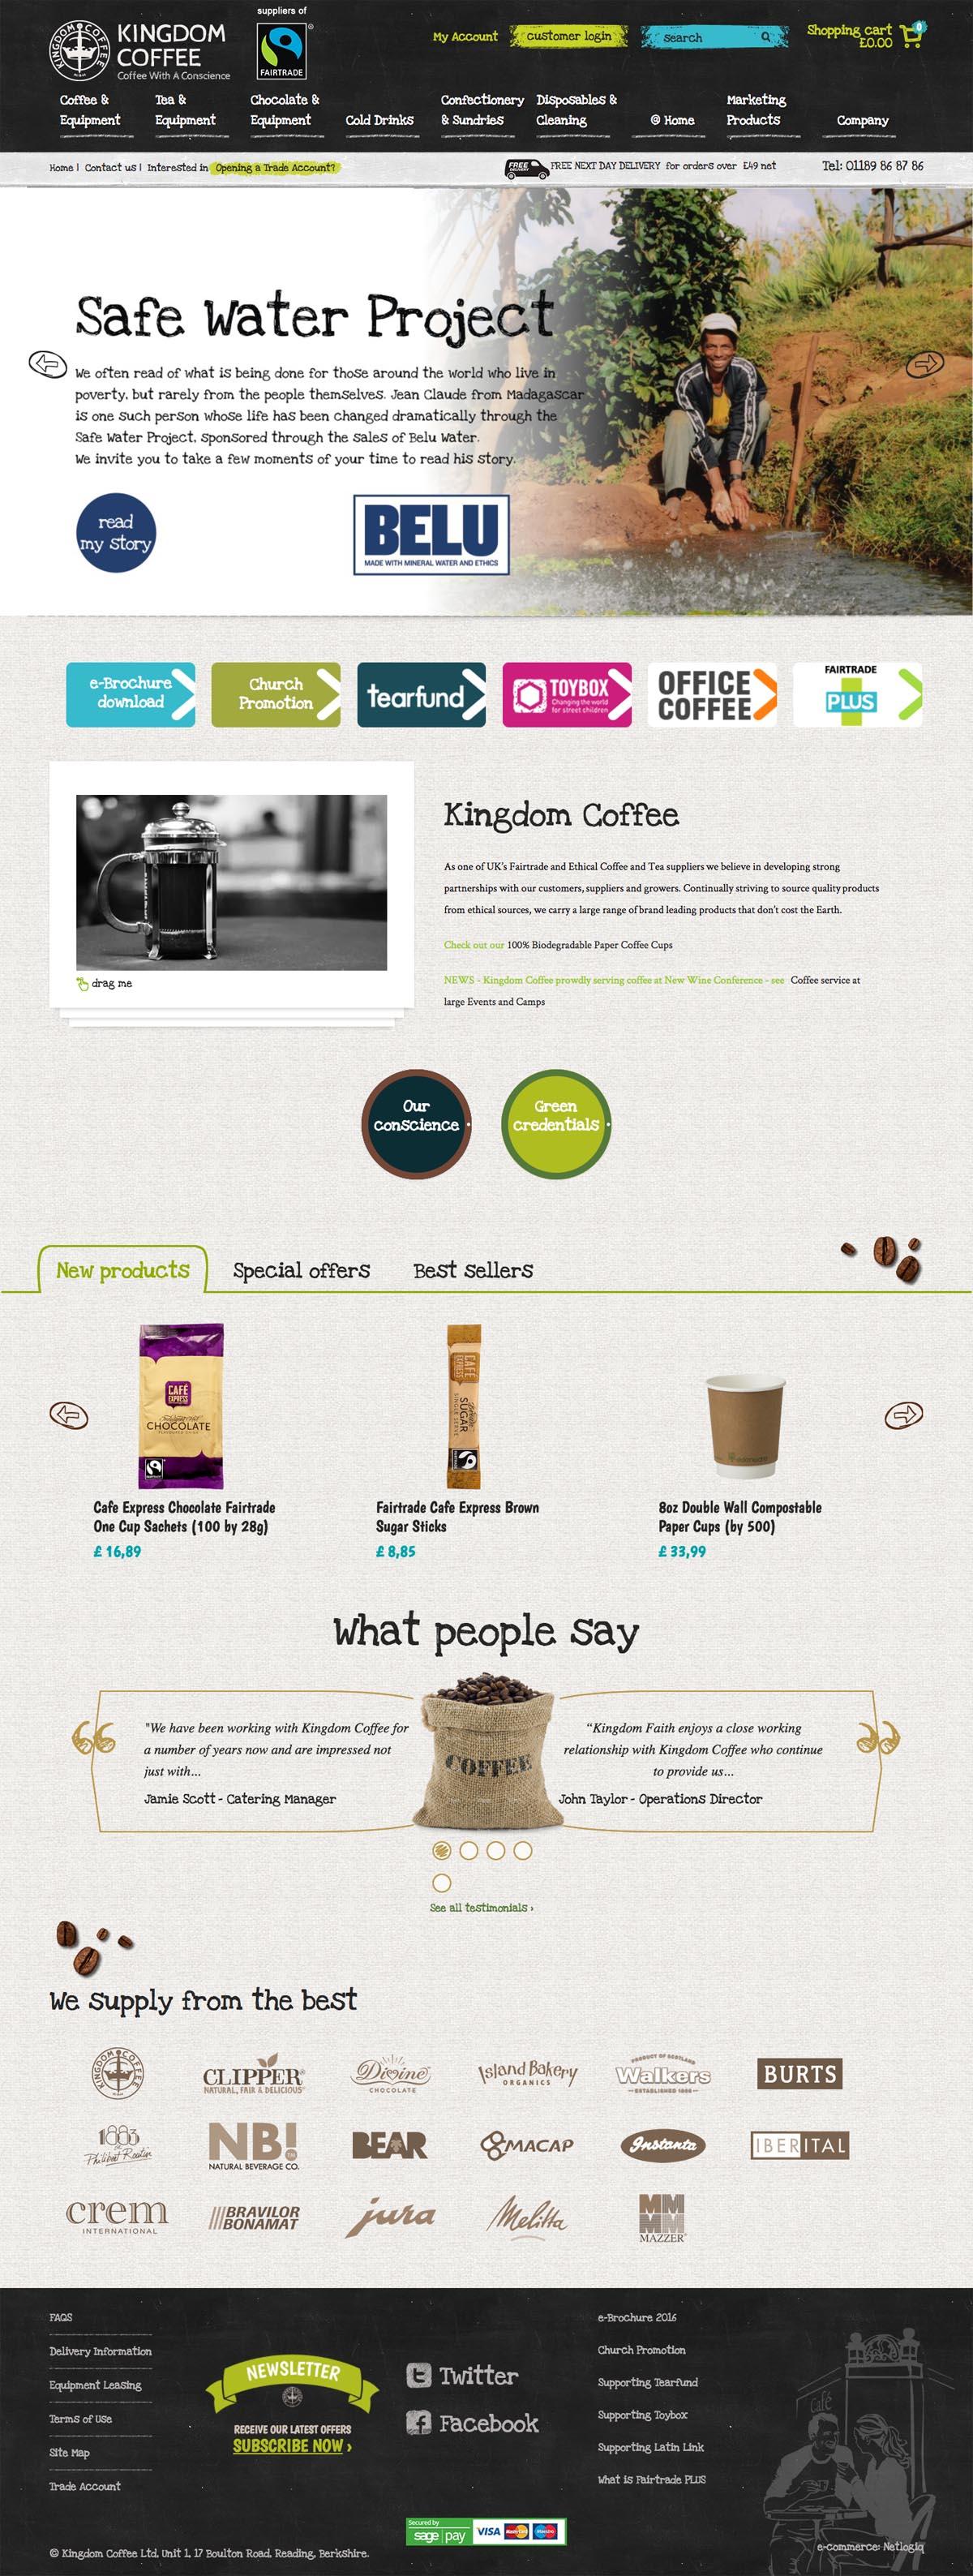 eCommerce website: Kingdom Coffee Ltd